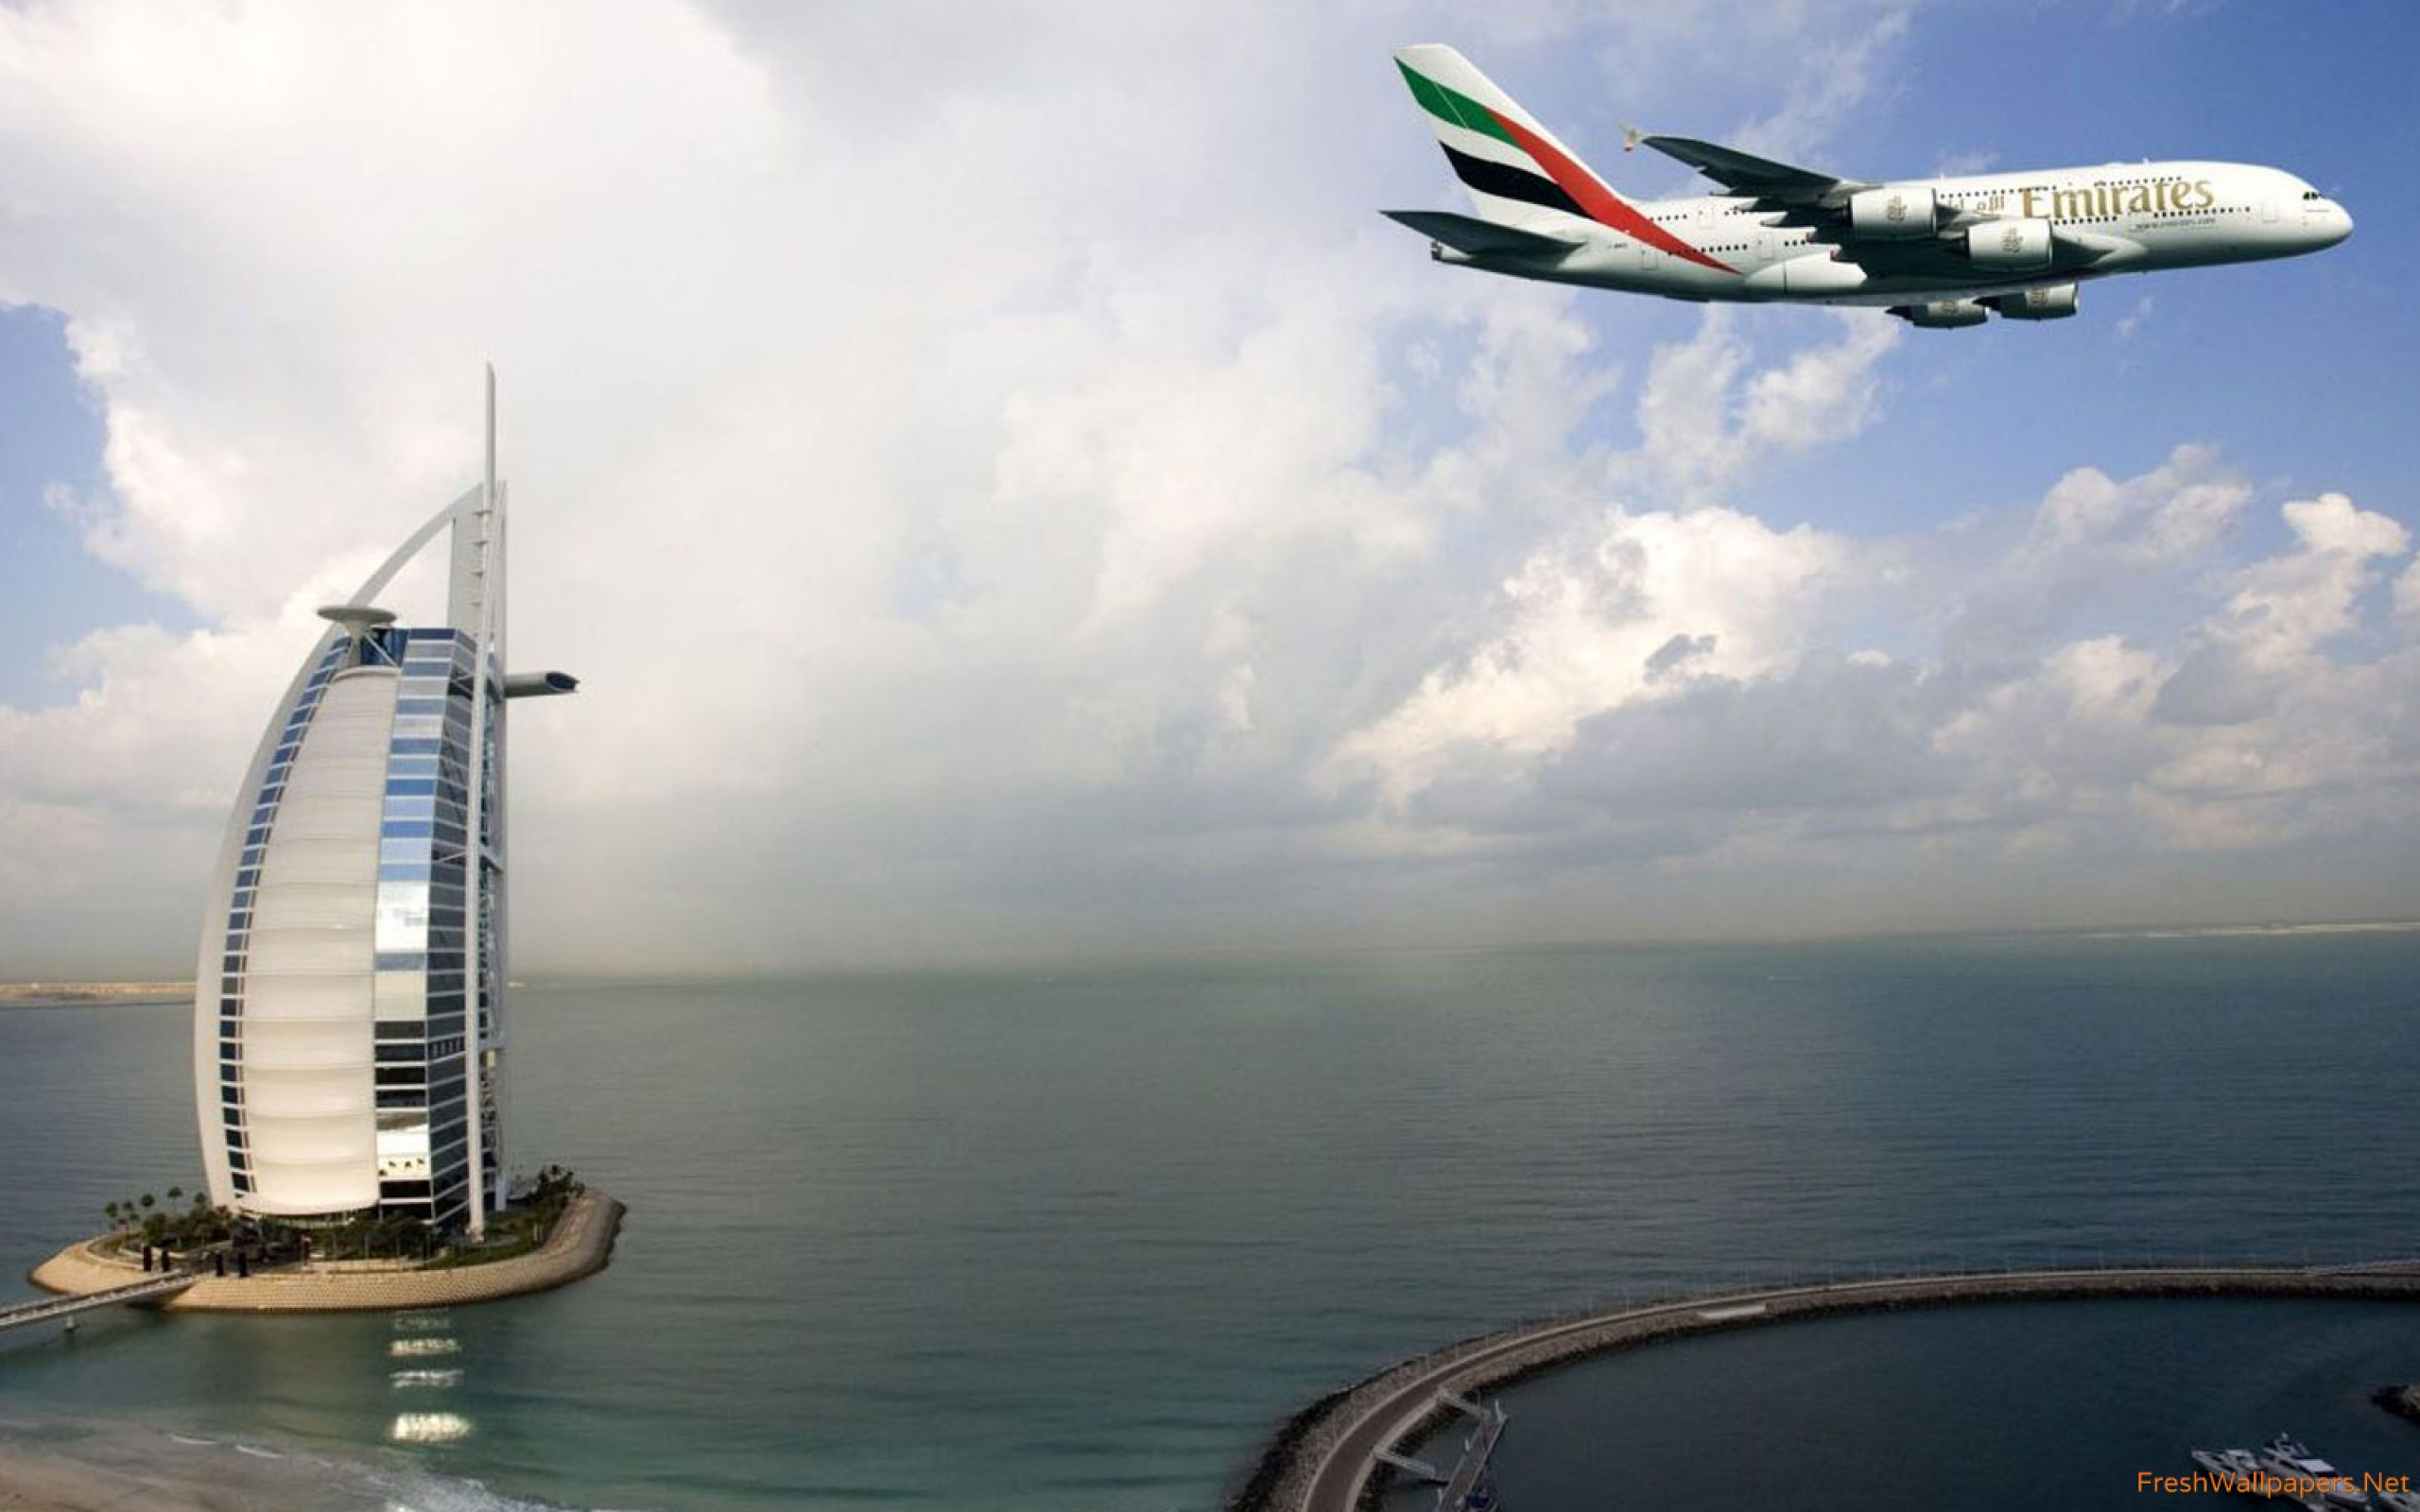 Emirates Dubai Burj Al Arab wallpapers Freshwallpapers 2560x1600